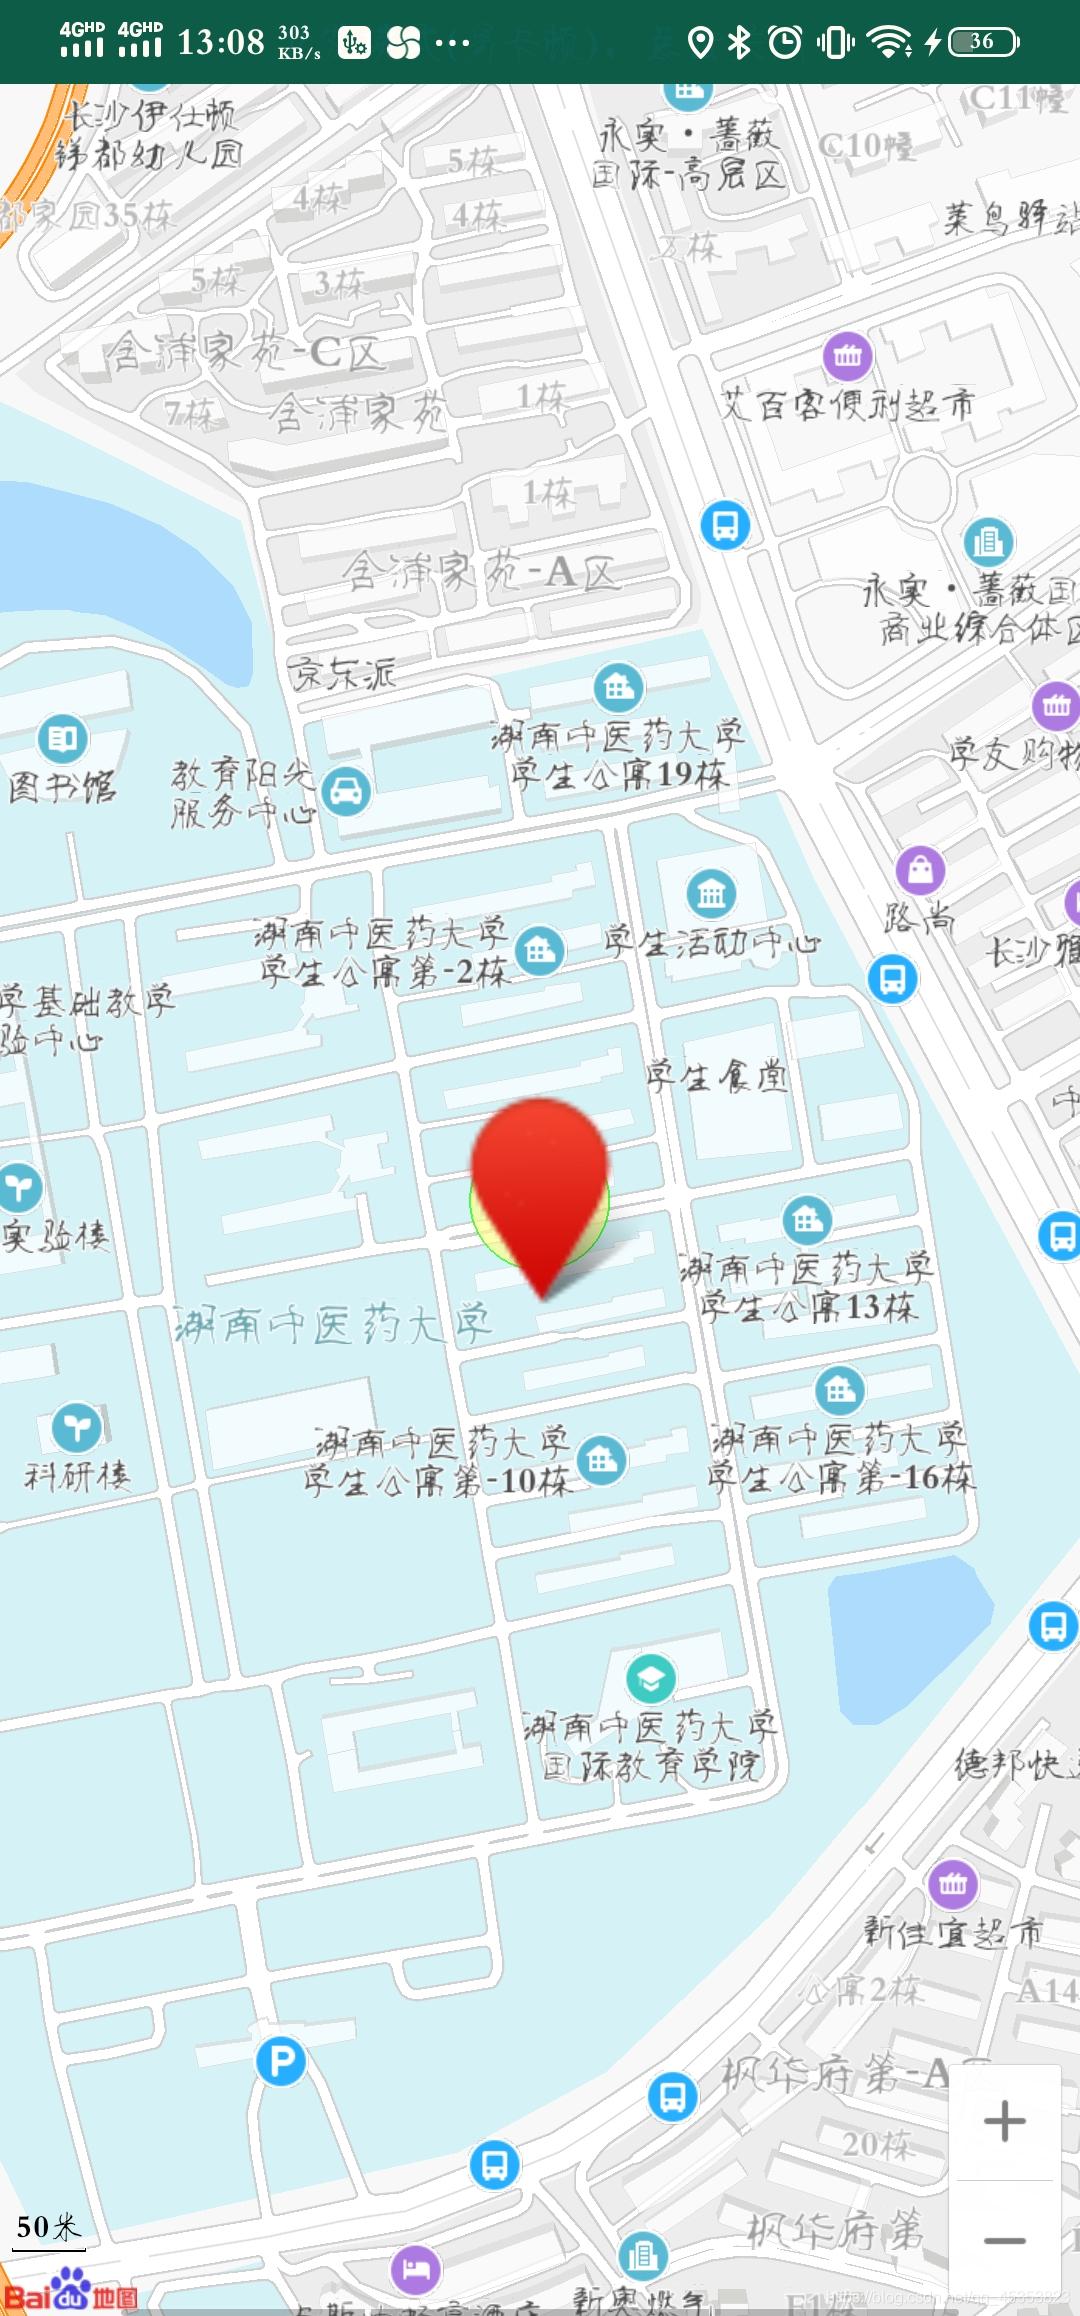 基于百度地图实现Android定位功能实现(详解+教程)qq45353823的博客-基于百度地图的android定位系统